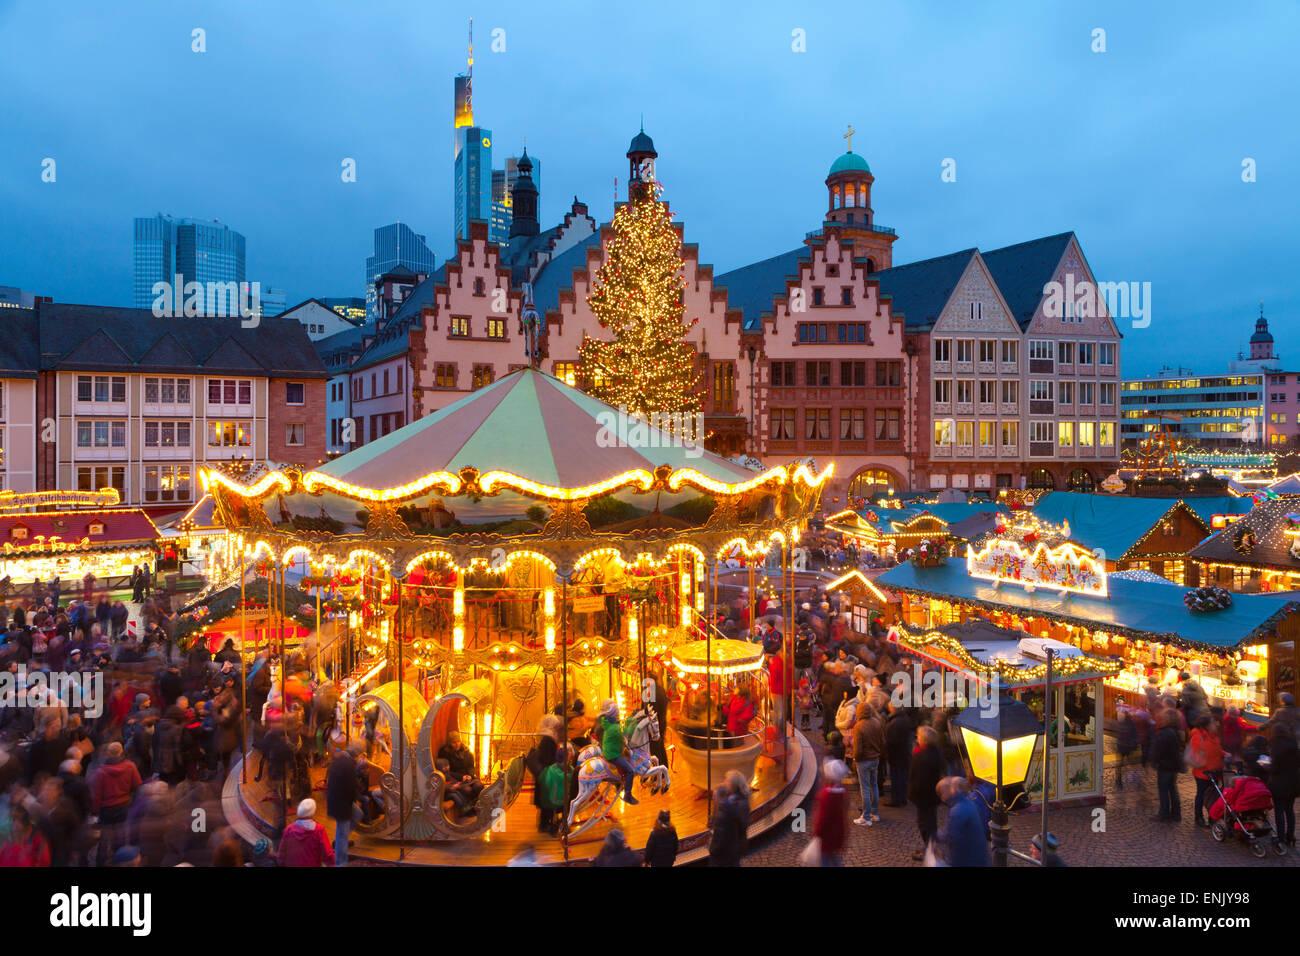 Christmas Market in Romerberg, Frankfurt, Germany, Europe - Stock Image